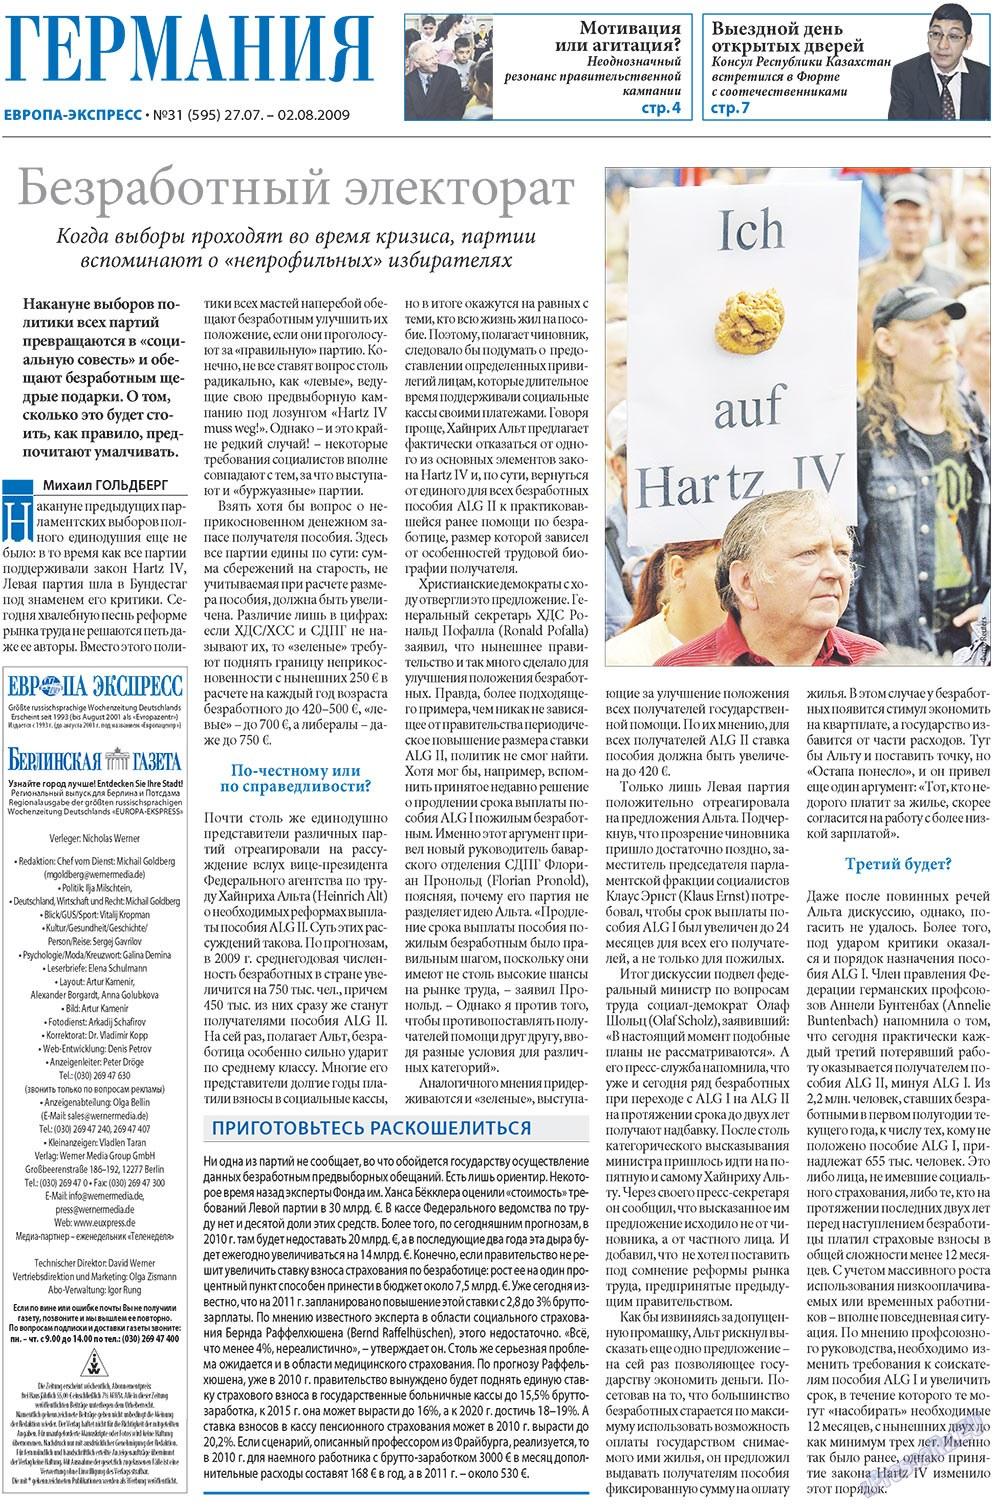 Европа экспресс (газета). 2009 год, номер 31, стр. 2